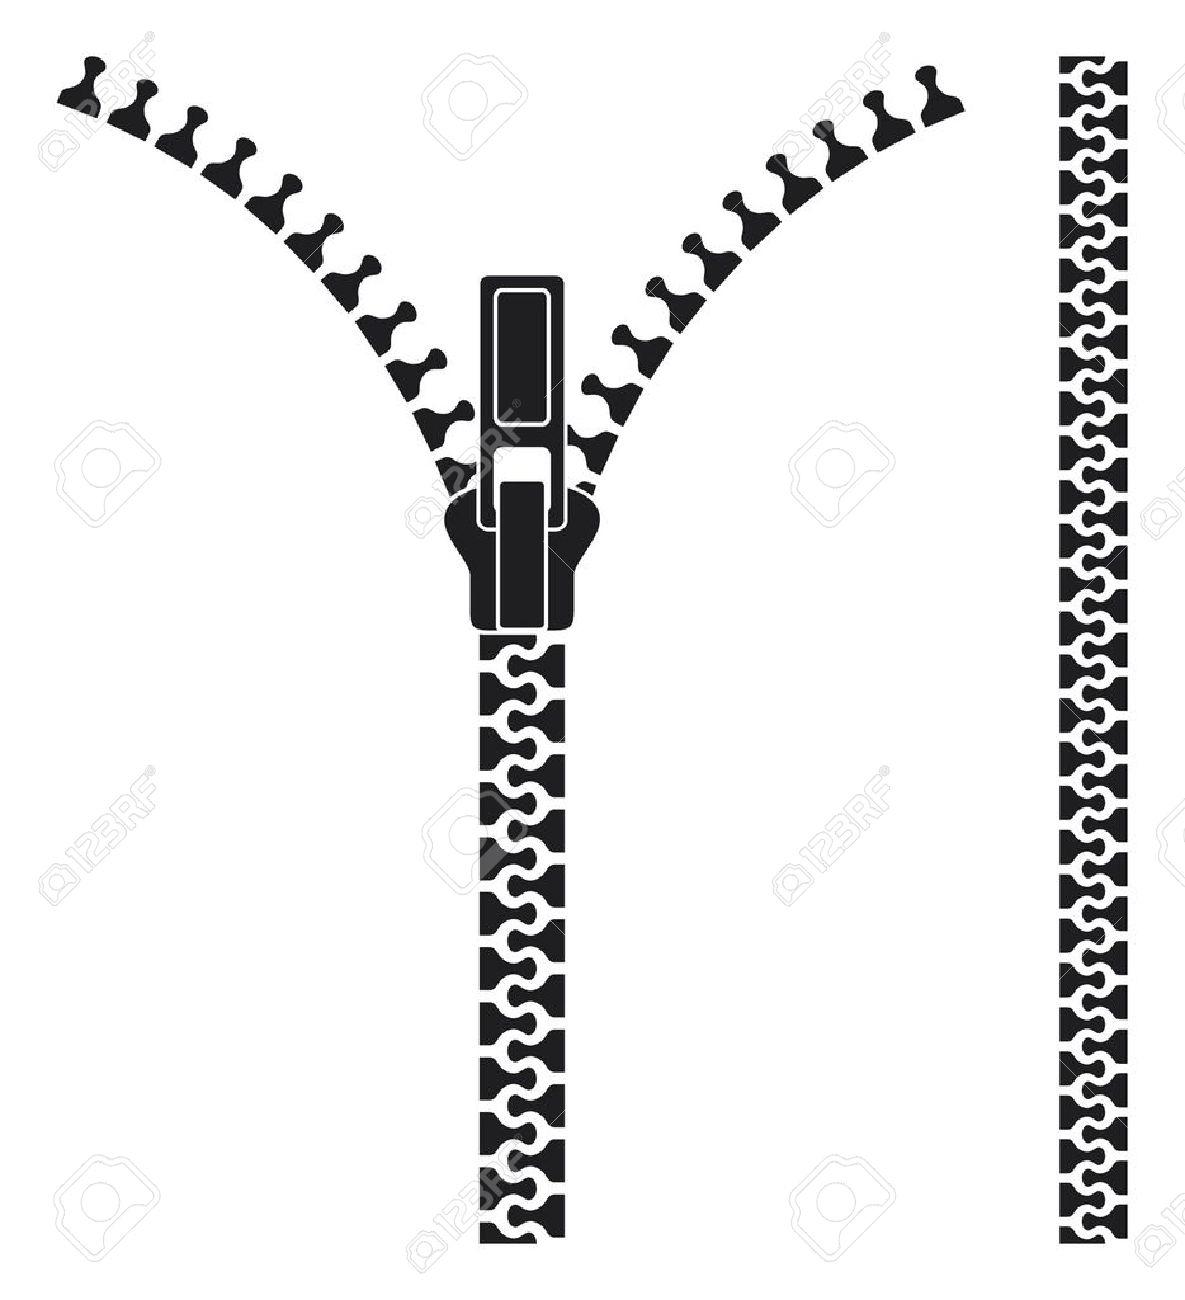 Zipper Black And White Clipart